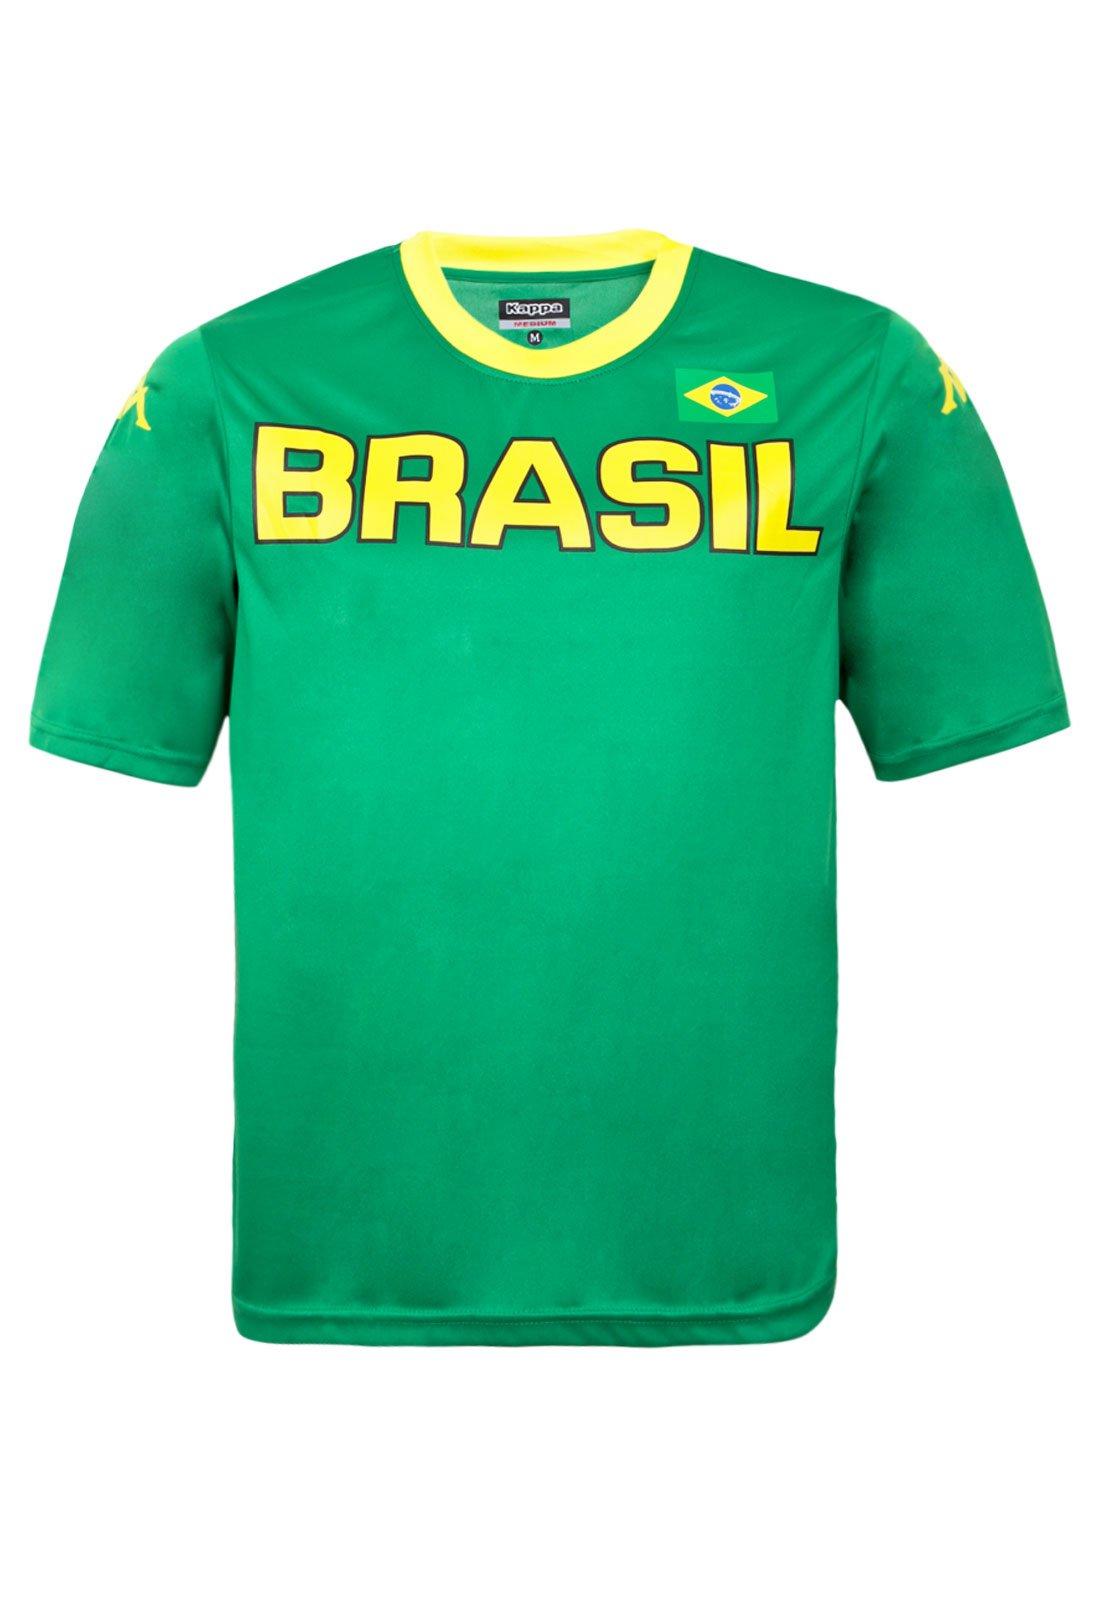 0b5cddb9e2a49 Camiseta Kappa Brasil Verde - Compre Agora